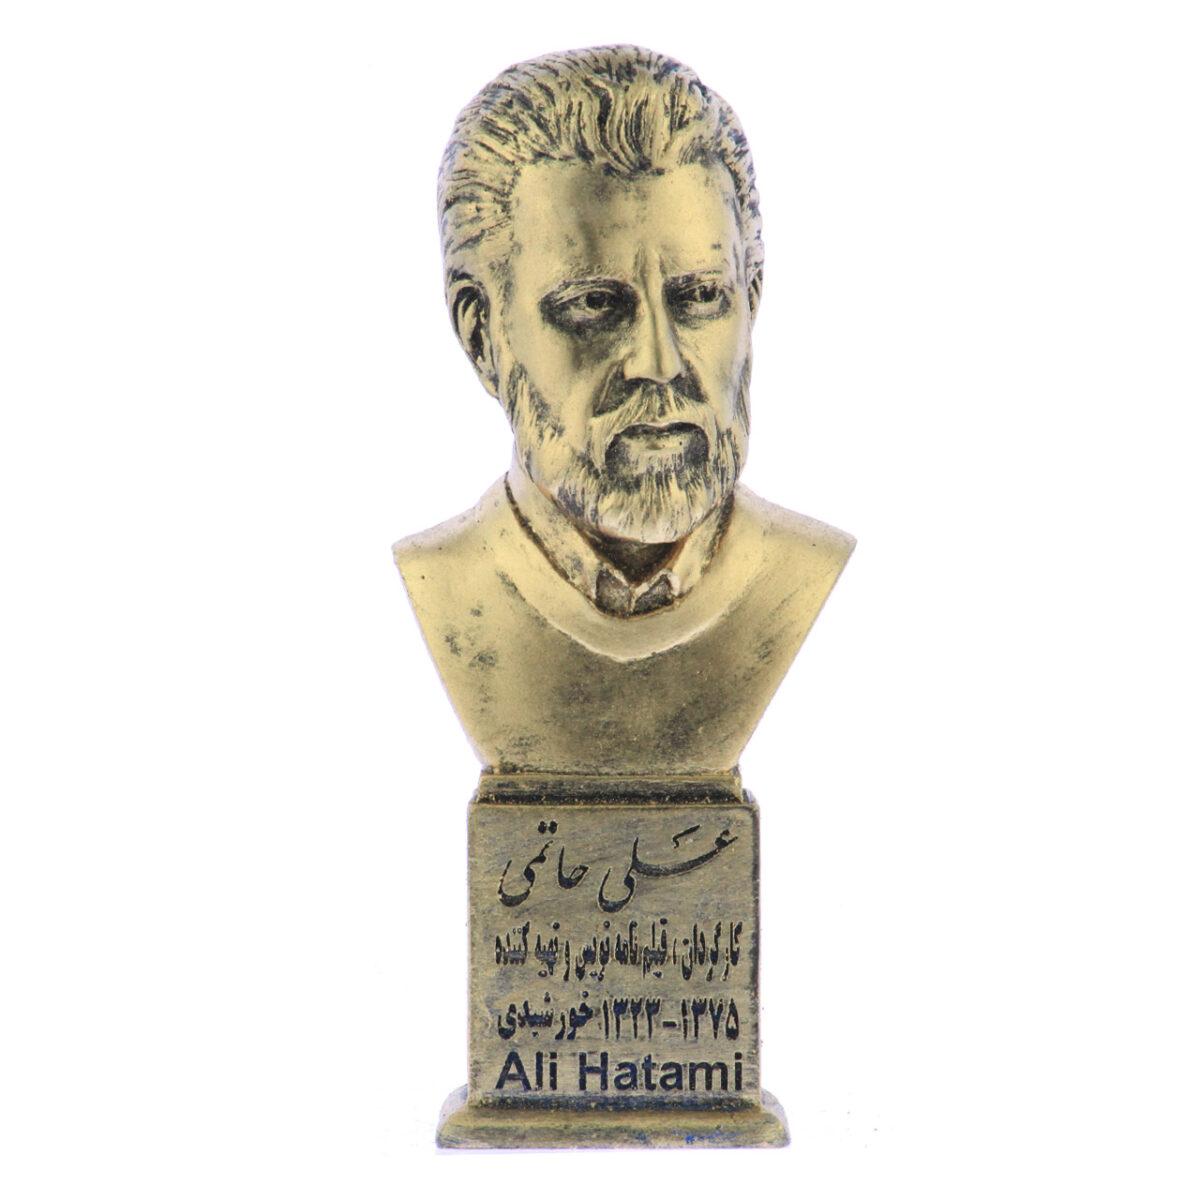 ali hatami b 1200x1200 - سردیس علی حاتمی